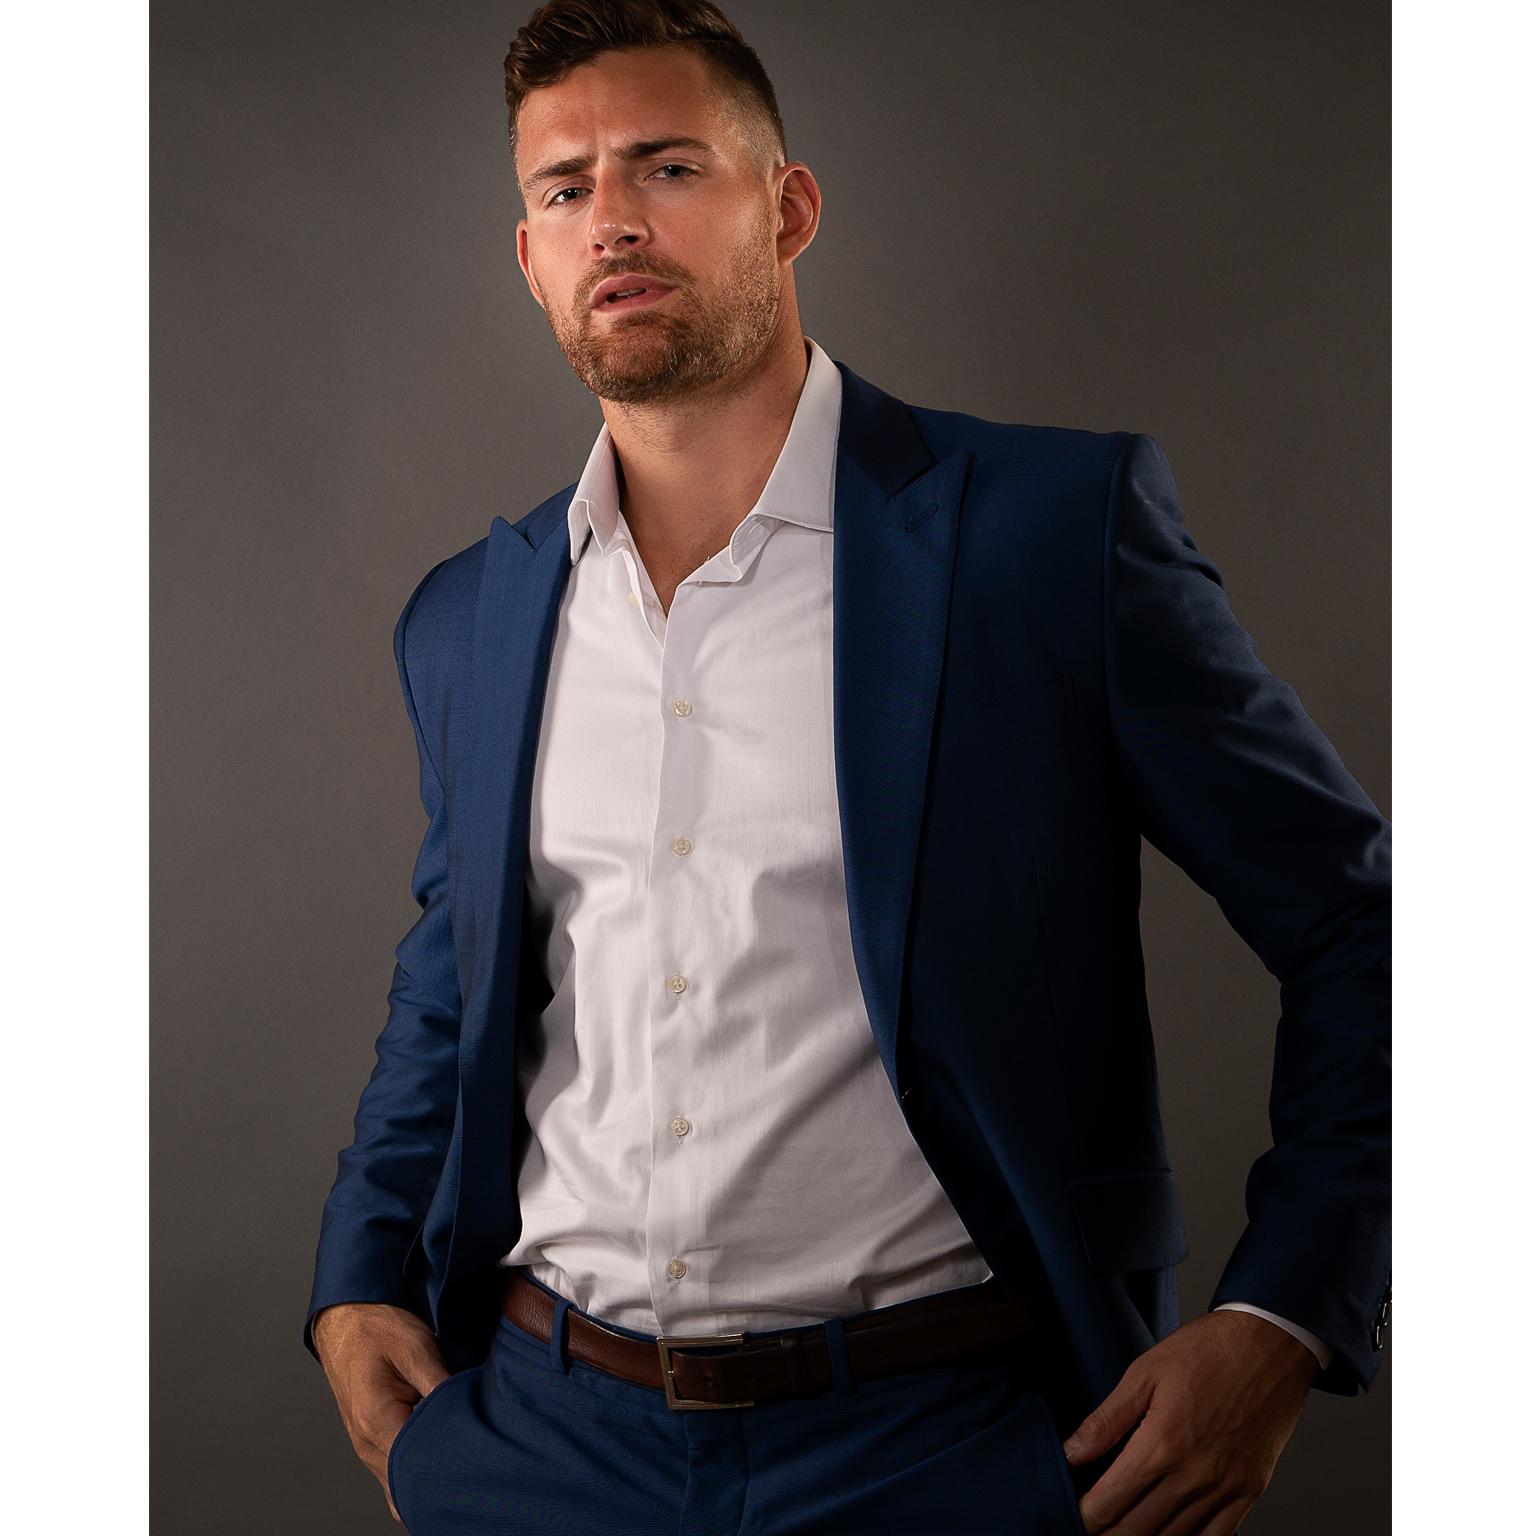 Toronto-Fitness-Model-Agency-Fashion-Suit-Justin-Baker